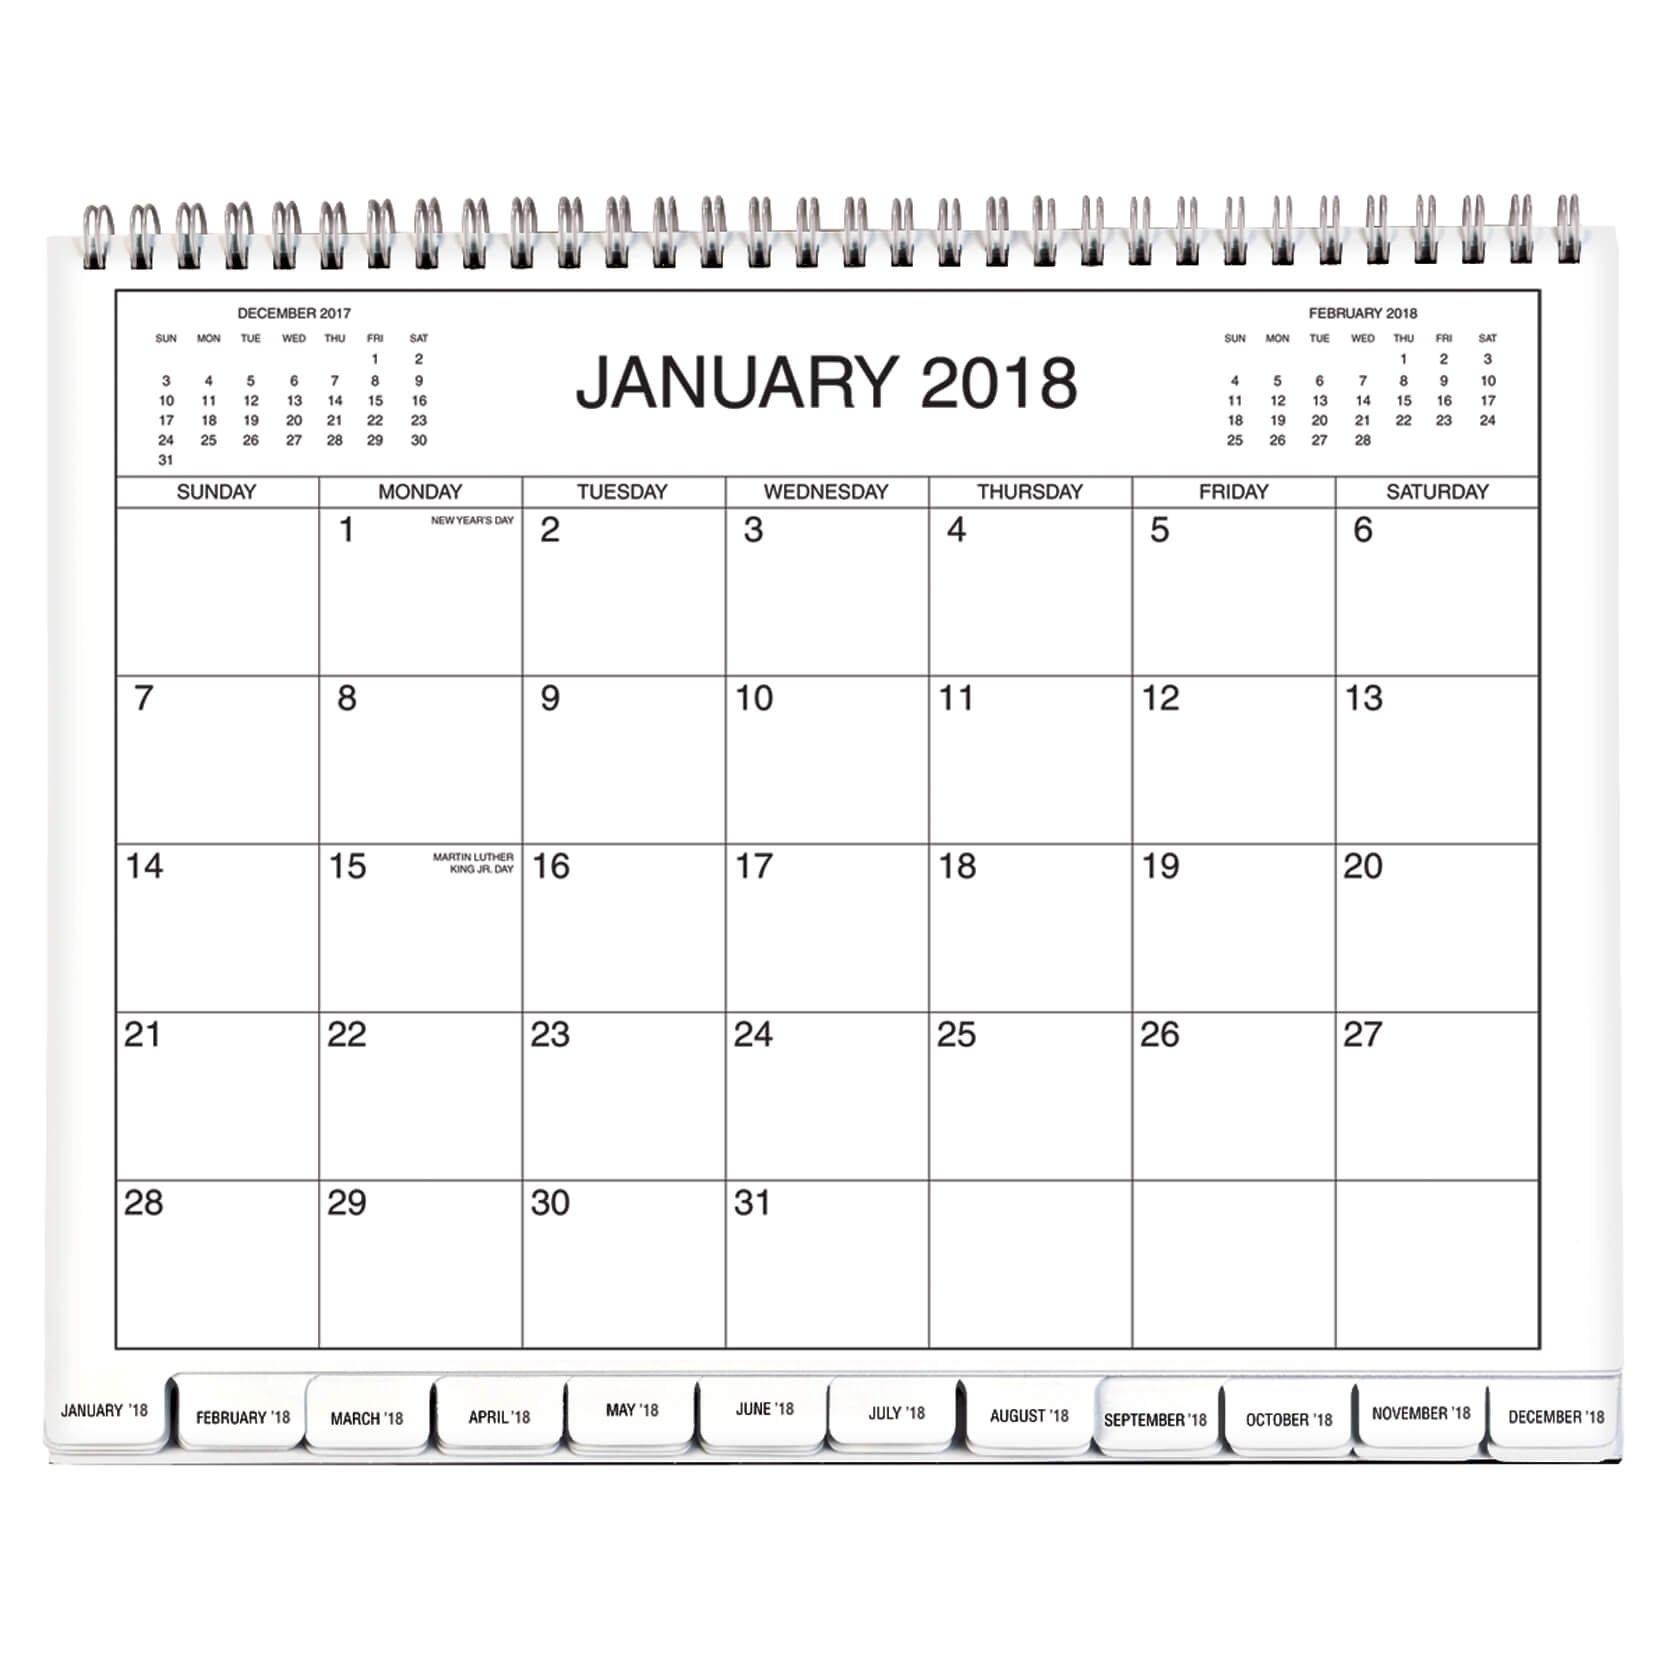 Calendars & Stationery Sale - Walter Drake Calendar 2019 On Sale